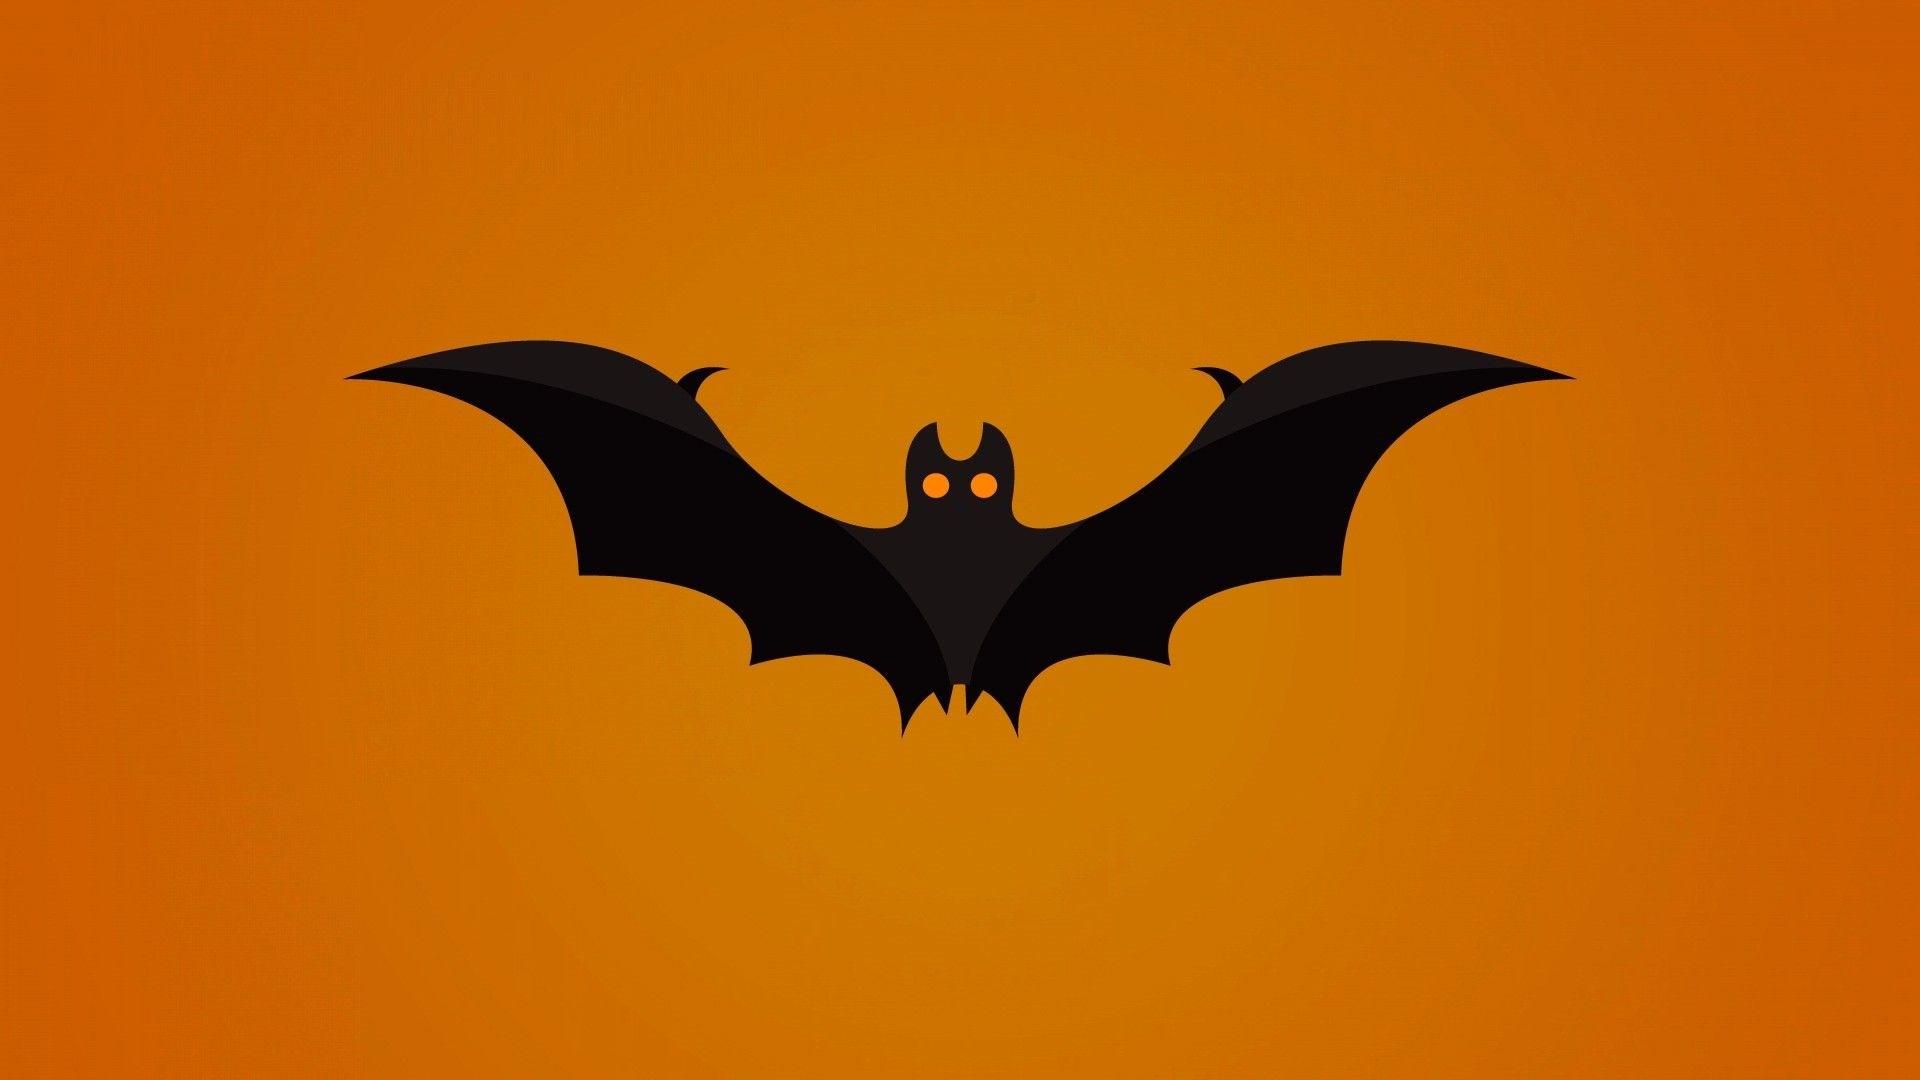 Bat High Quality